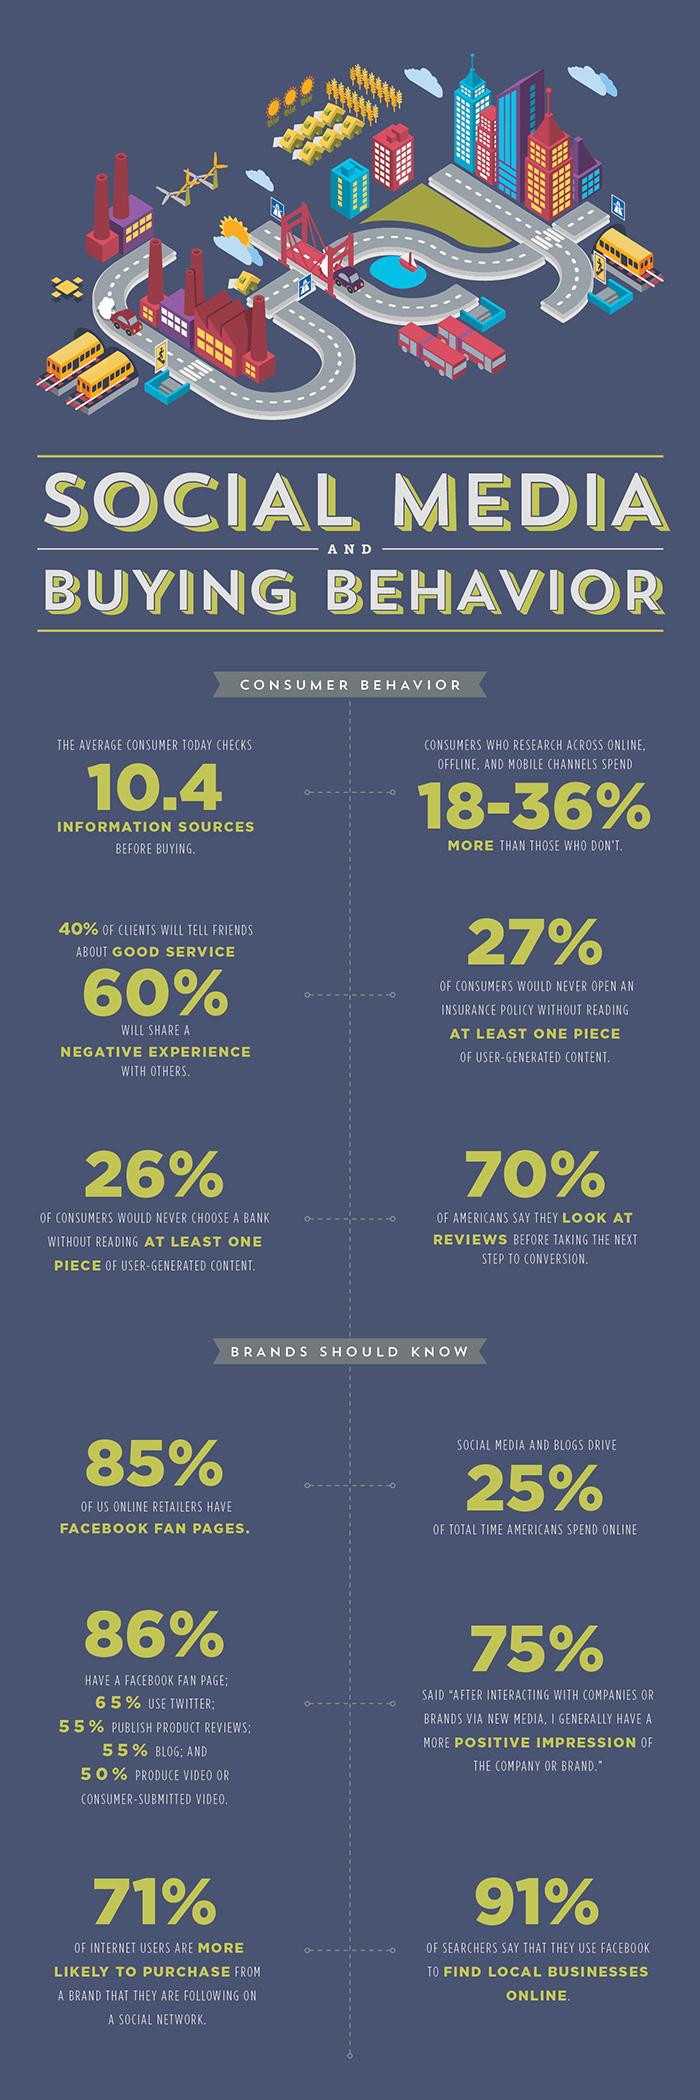 Infographic17b.jpg